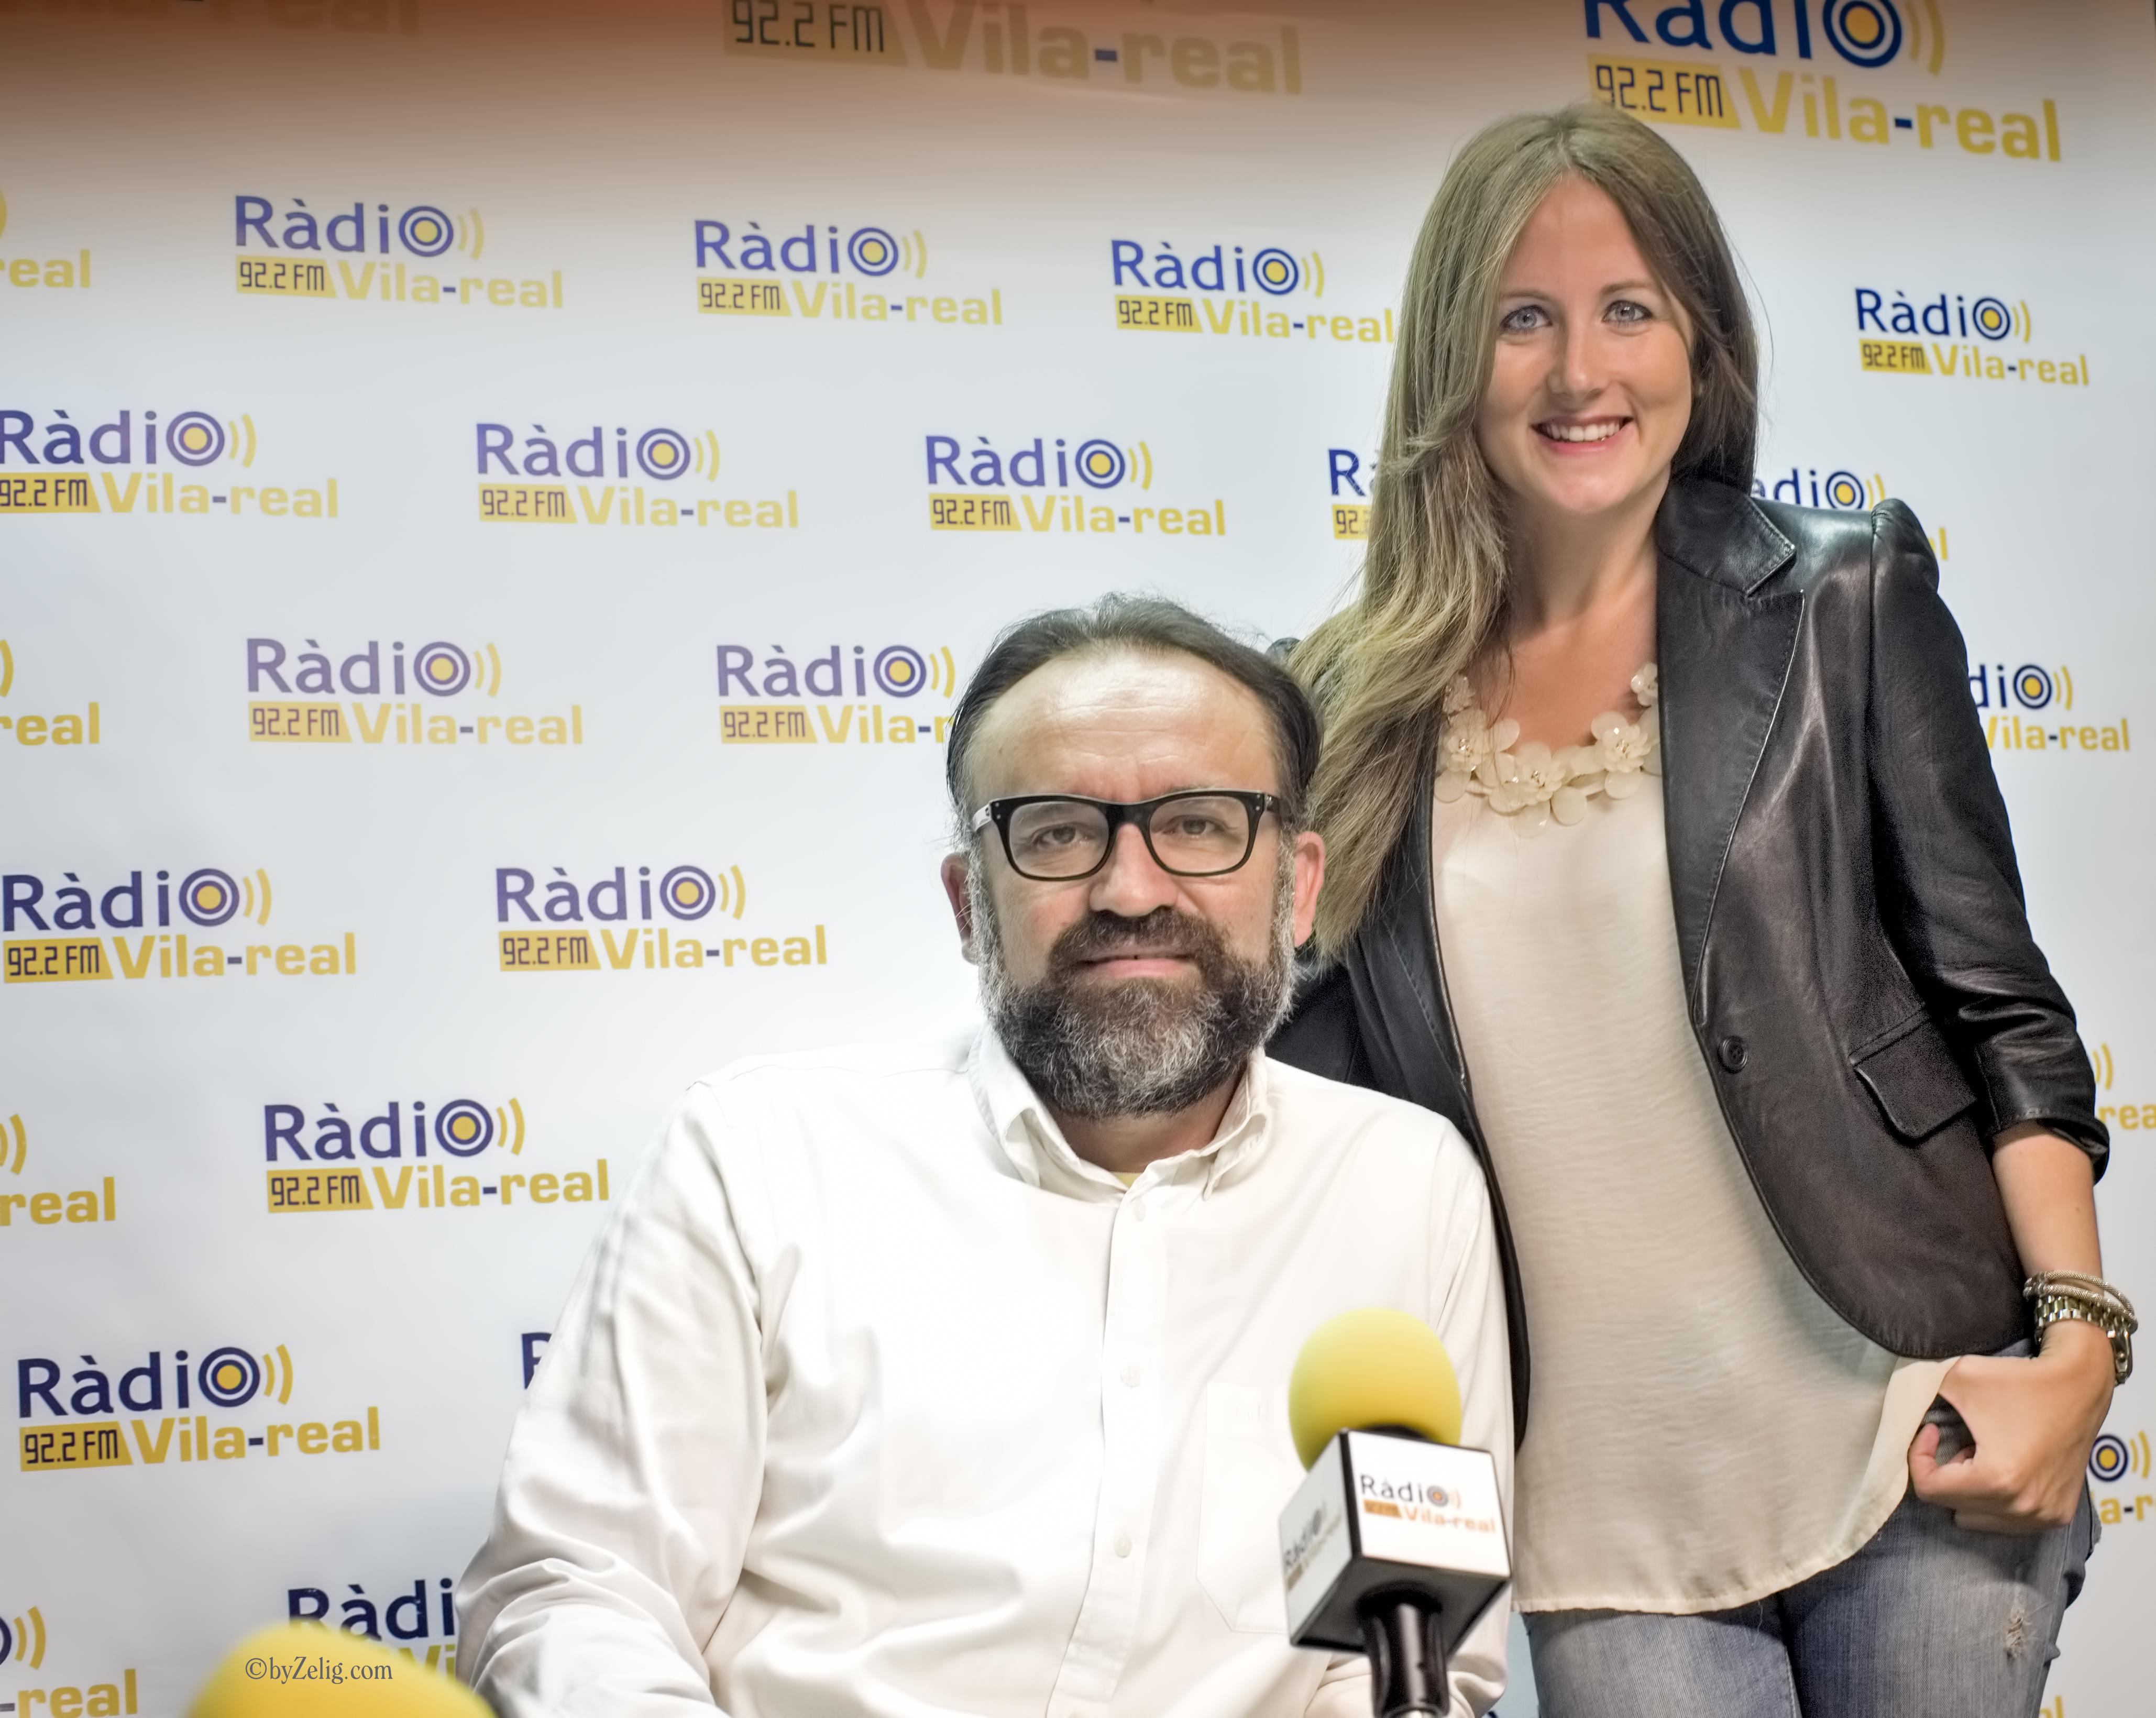 Esports Radio Vila-real. Programa del 1 de febrero 2018